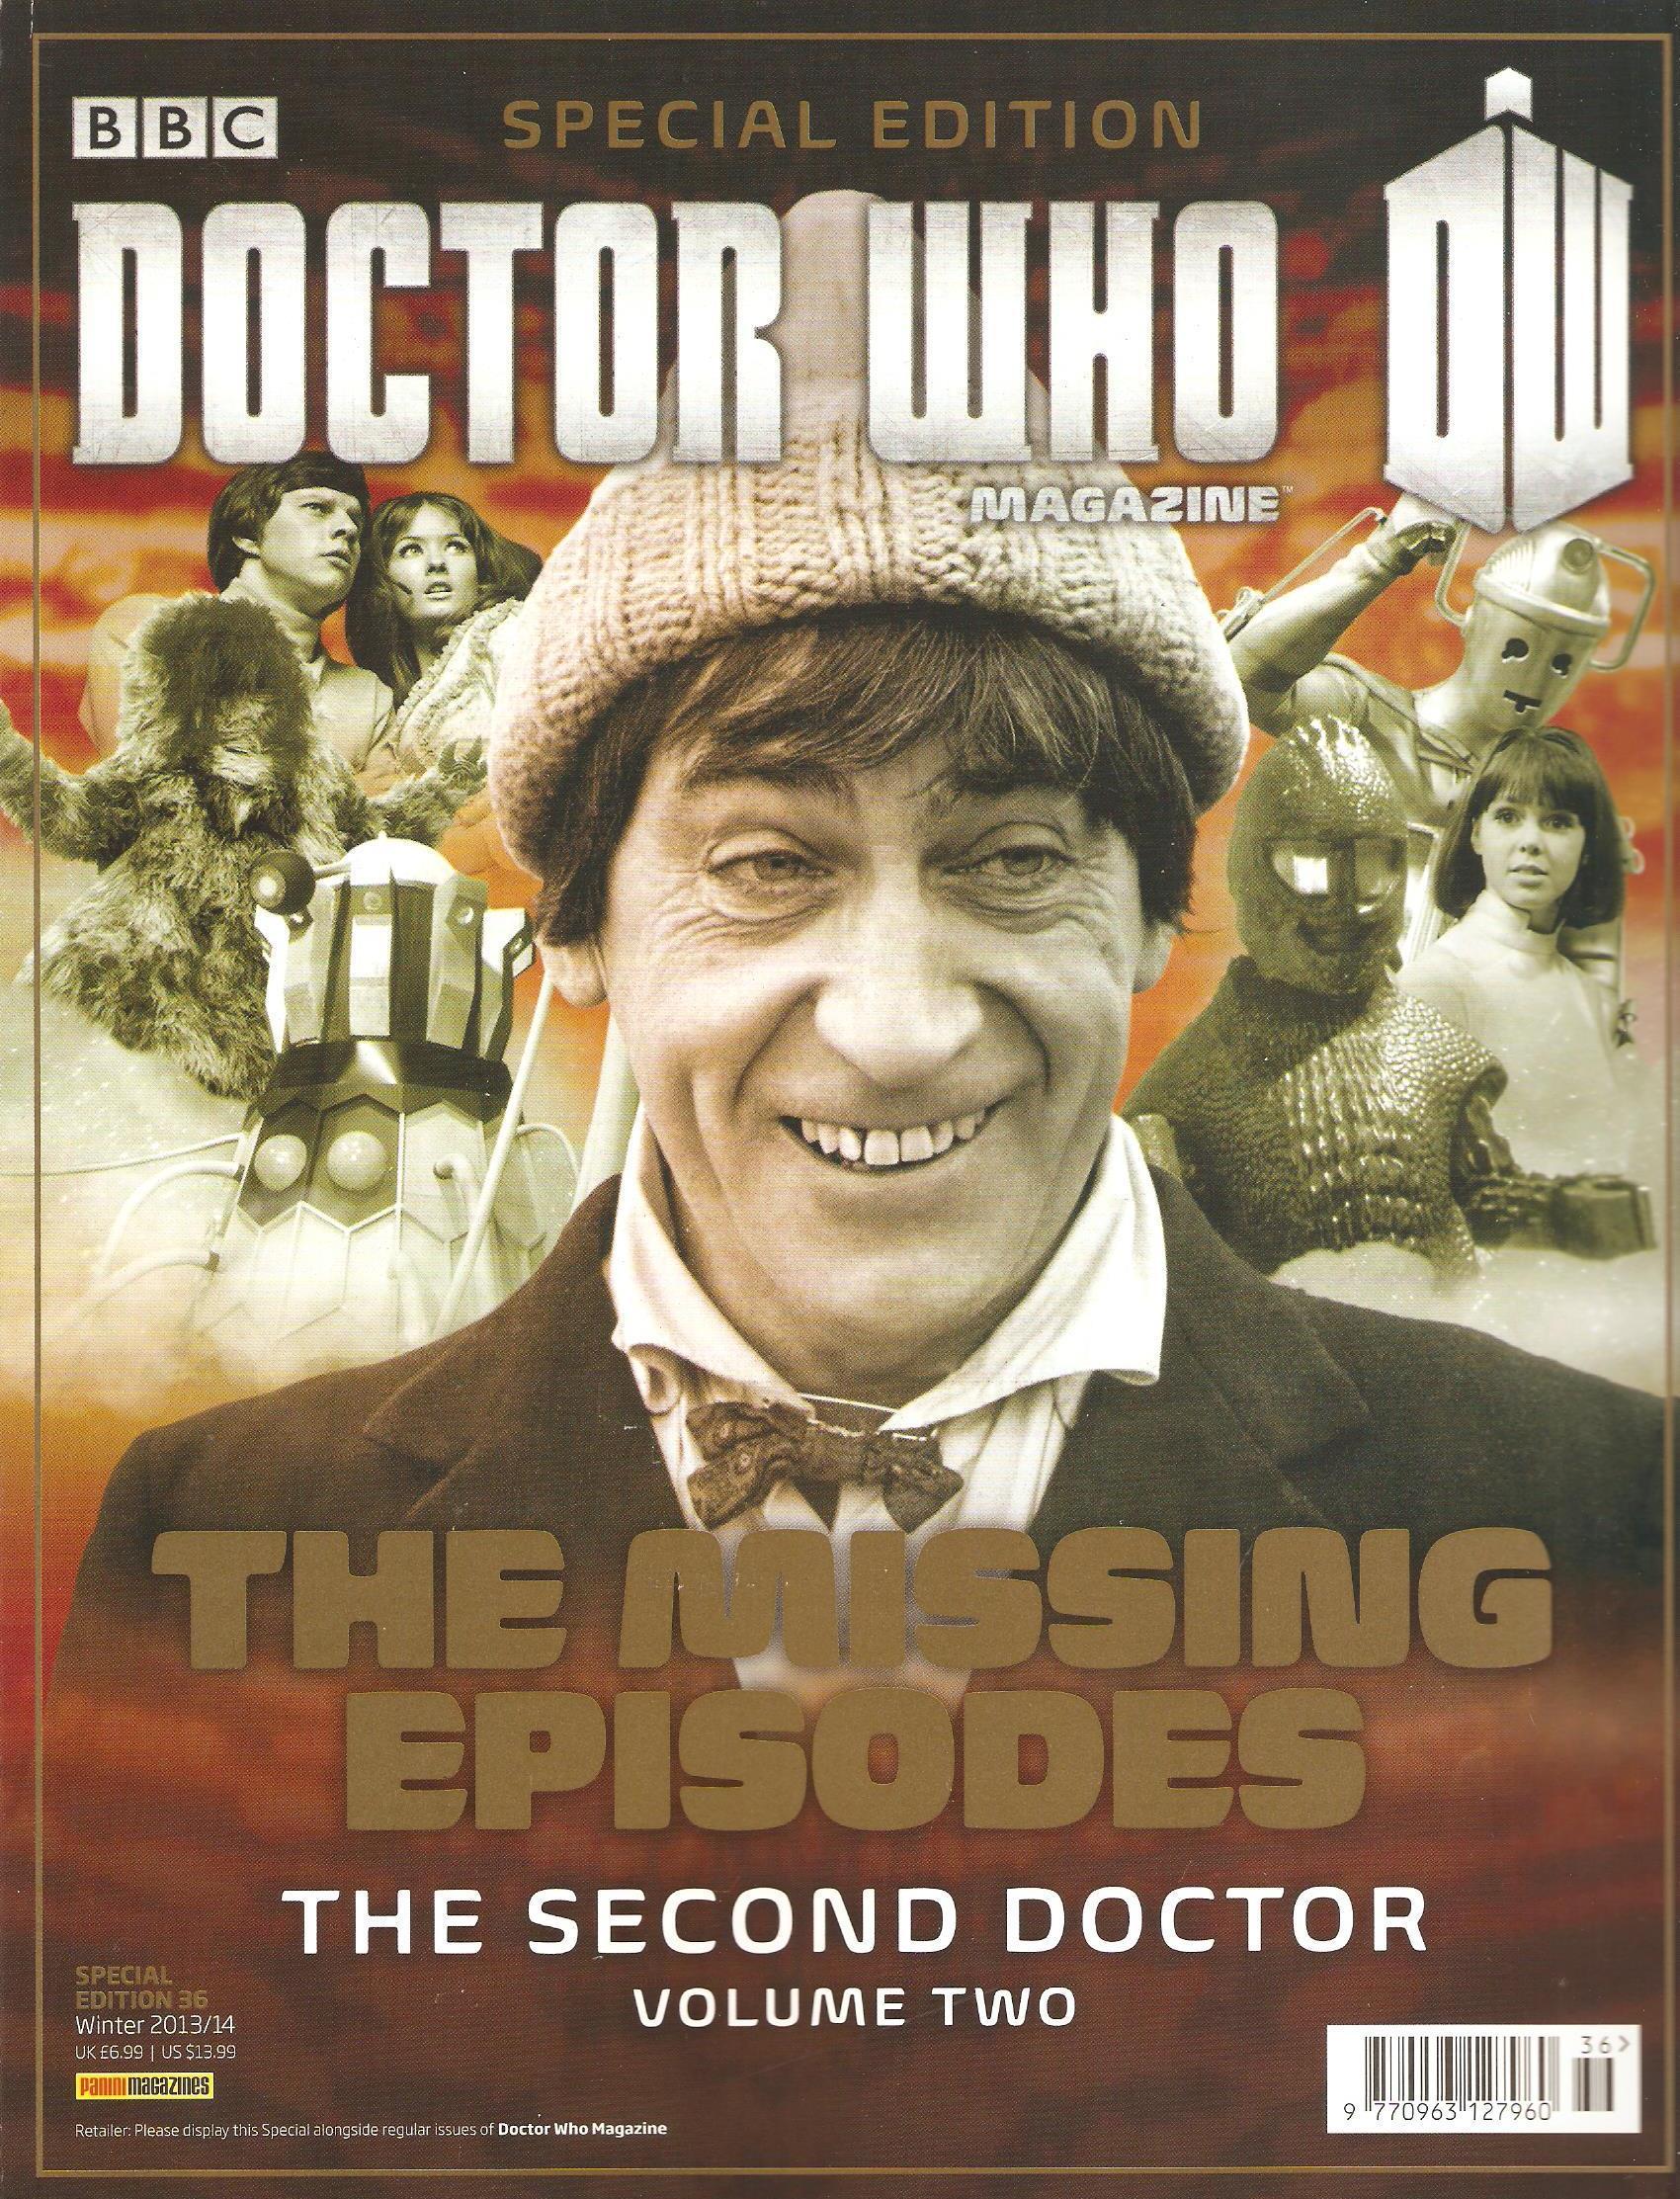 Dwm se missing episodes second doctor volume two